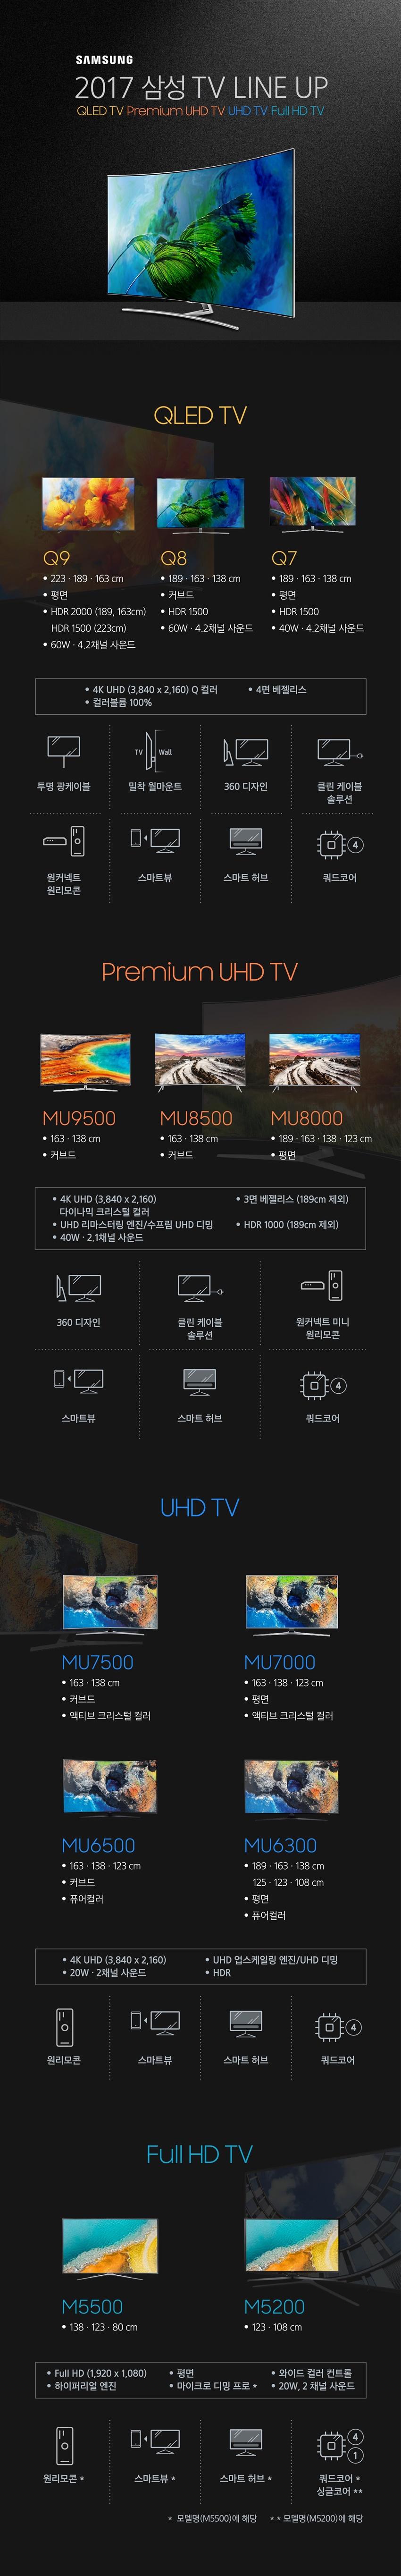 SAMSUNG 2017 삼성 TV LINE UP QLED TV Premium UHD TV Full HD TV QLED TV Q9 223,189,163cm 평면 HDR 2000 (189,163cm) HDR 1500 (223cm) 60W 4.2채널 사운드 Q8 189,163,138cm 커브드 HDR 1500 60W 4.2채널 사운드 Q7 189,163,138cm 평면 HDR 1500 40W 4.2채널 사운드 4K UHD(3,840x2,160)Q컬러 4면 베젤리스 컬러볼륨 100% 투명 광케이블 밀착 월마운트 360 디자인 클린 케이블 솔루션 원커넥트 원리모콘 스마트뷰 스마트 허브 쿼드코어 MU9500 163,138cm 커브드 MU8500 163,138cm 커브드 MU8000 189,163,123cm 평면 4K UHD (3,840x 2,160) 다이나믹 크리스털 컬러 3면 베젤리스 (189cm 제외) UHD 리마스터링 엔진 및 수프림 UHD 디밍 HEF 1000(189cm 제외) 40W 2.1채널 사운드 360 디자인 클린 케이블 솔루션 원커넥트 미니 원리모콘 스마트뷰 스마트 허브 쿼드코어 UHD TV MU7500 163,138cm 커브드 액티브 크리스털 컬러 MU7000 163,138,123cm 평면 액티브 크리스털 컬러 MU6500 163,138,123cm 커브드 퓨어컬러 MU6300 189,163,138츠 125,123,108cm 평면 퓨어컬러 4K UHD (3,840x2,160) 20W 2채널 사운드 UHD 업스케일링 엔진 및 UHD 디밍 HDR 원리모콘 스마트뷰 스마트 허브 쿼드코어 Full HD TV M5500 138,123,80cm M5200 123,108cm Full HD (1,920x1,080) 하이퍼리얼 엔진 평면 마이크로 디밍 프로 * 와이드 컬러 컨트롤 20W 2채널 사운드 원리모콘* 스마트뷰* 스마트 허브* 쿼드코어* 싱글코어** *모델명(M5500)에 해당 ** 모델명(M5200)에 해당